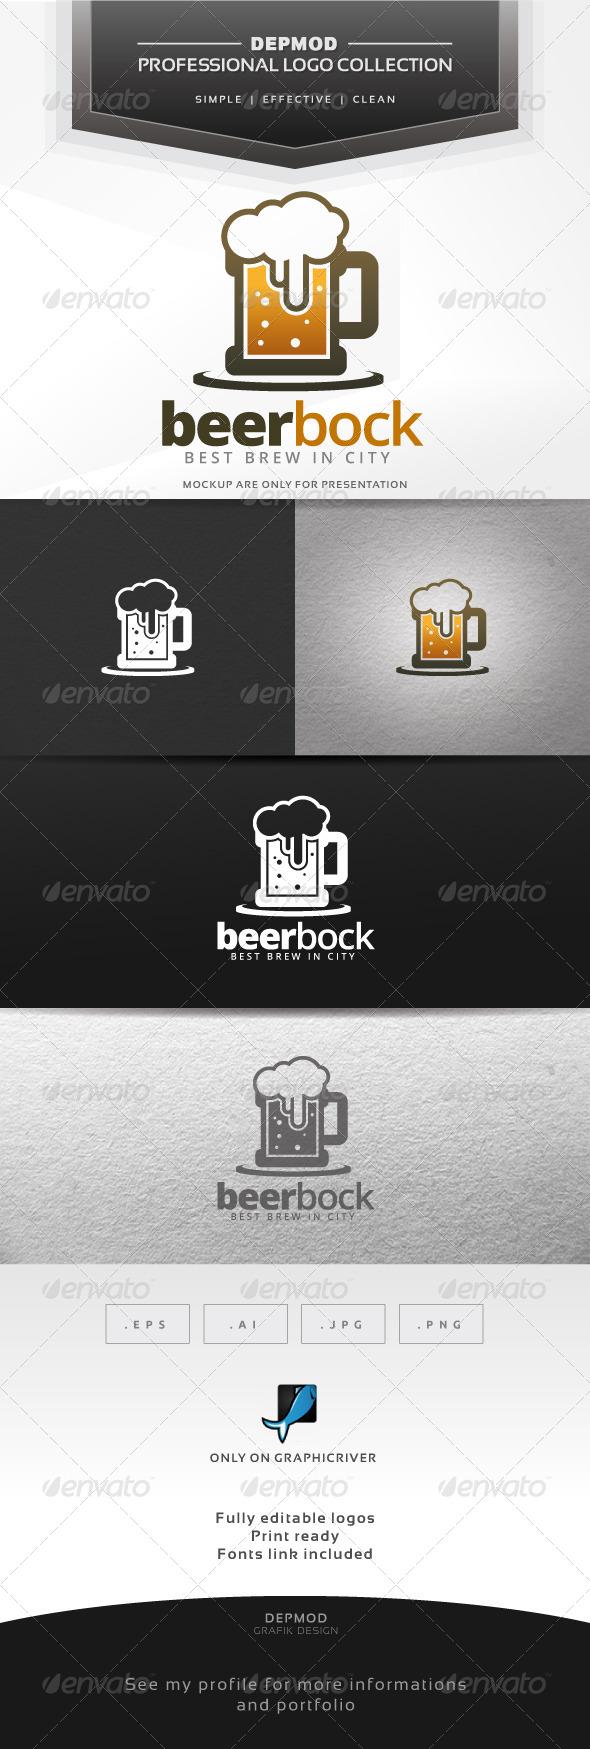 GraphicRiver Beer Bock Logo 6552530